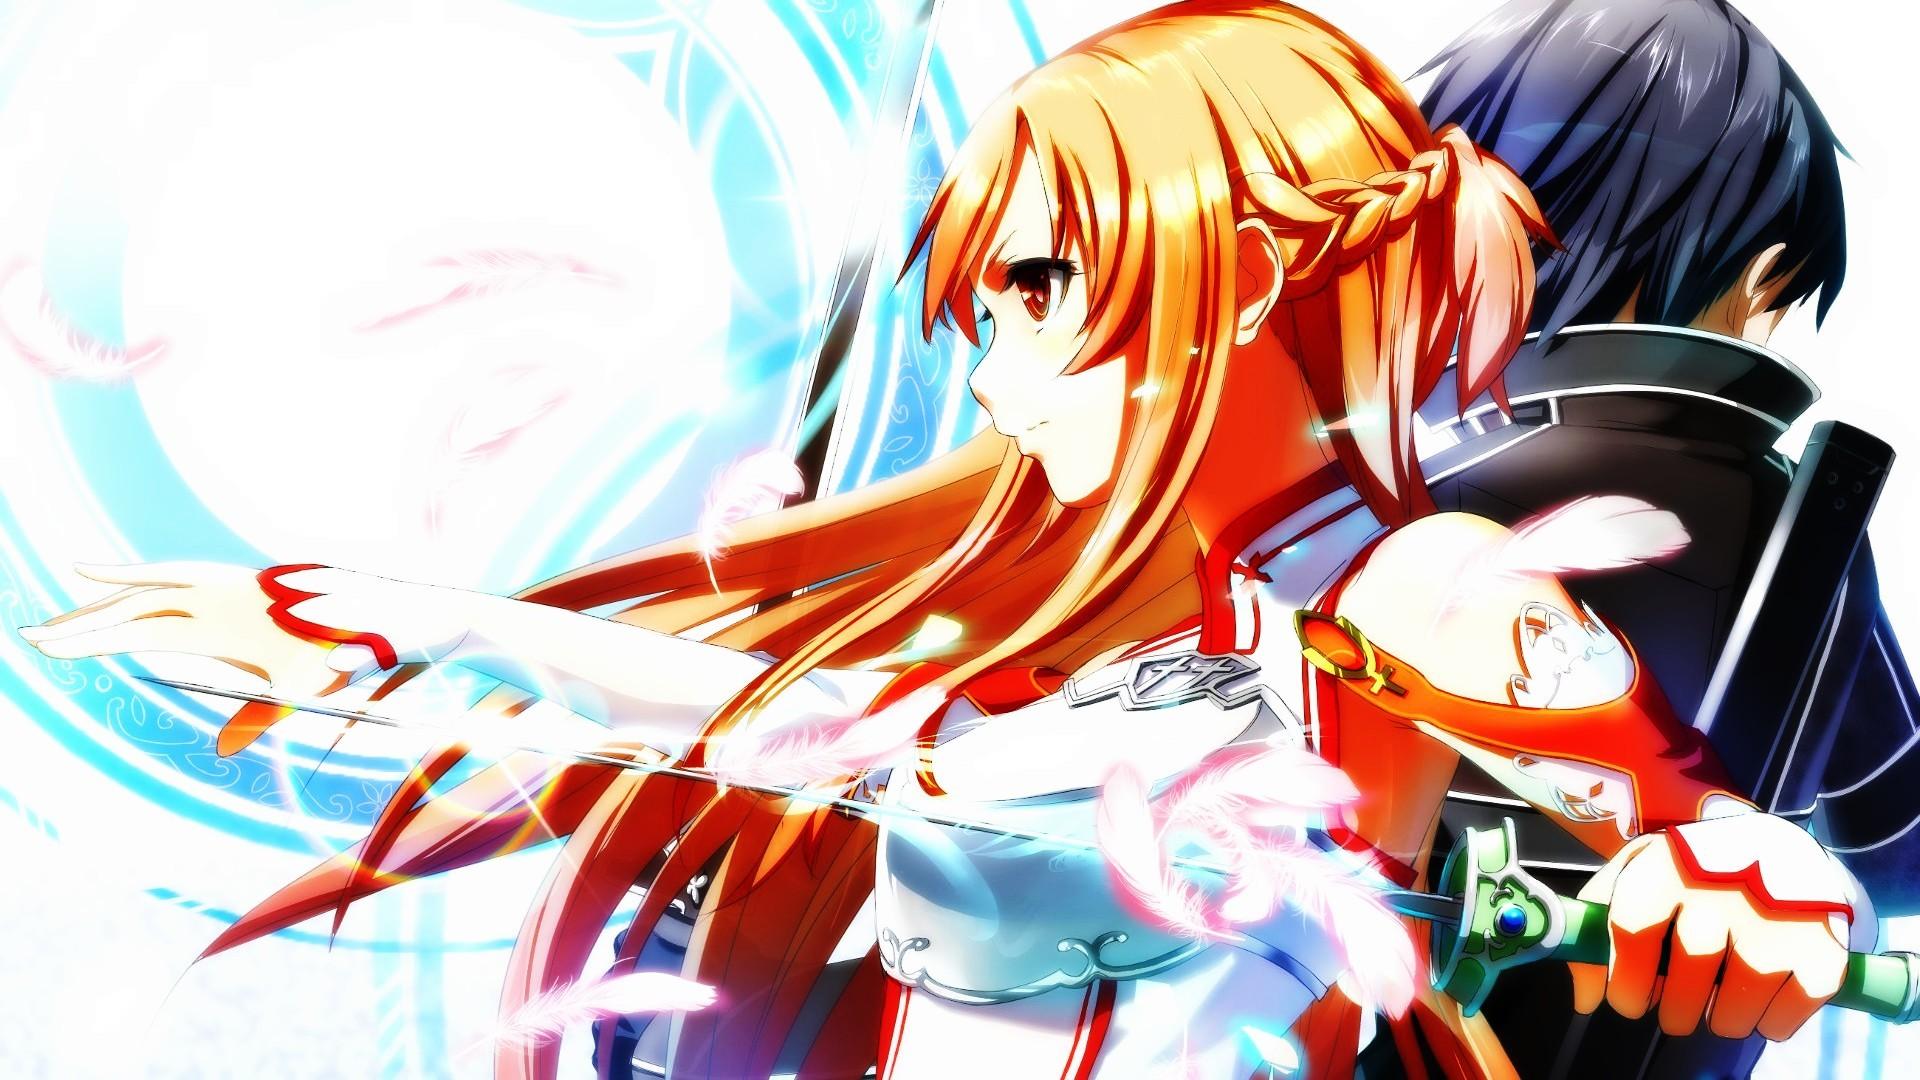 Sword Art Online Kirigaya Kazuto Yuuki Asuna Orange Hair Anime Girls Swords  Artwork Orton Effect …